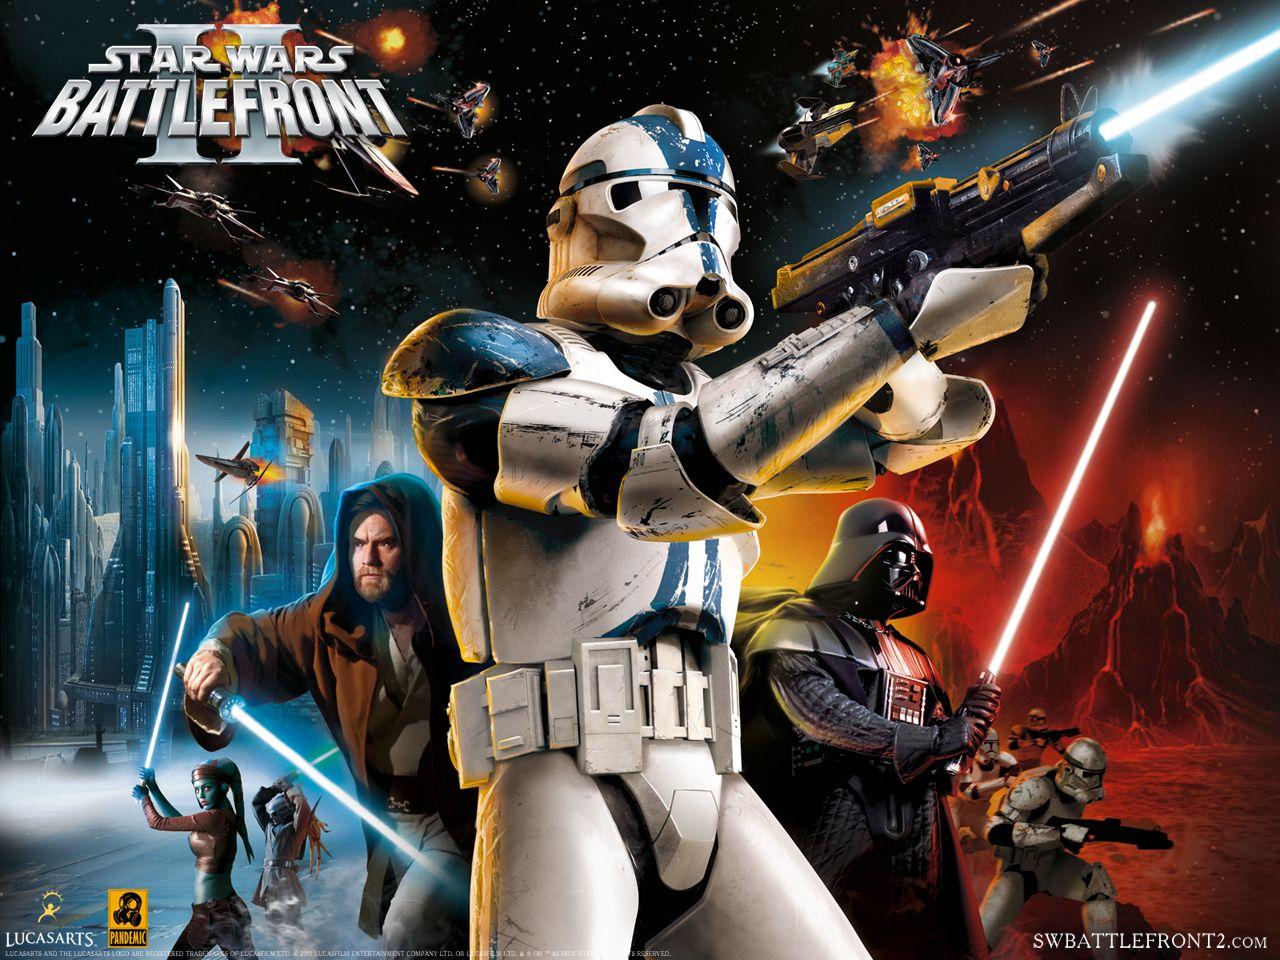 Star Wars Battlefront Ii Wallpaper Star Wars Battlefront Star Wars Games Star Wars Wallpaper